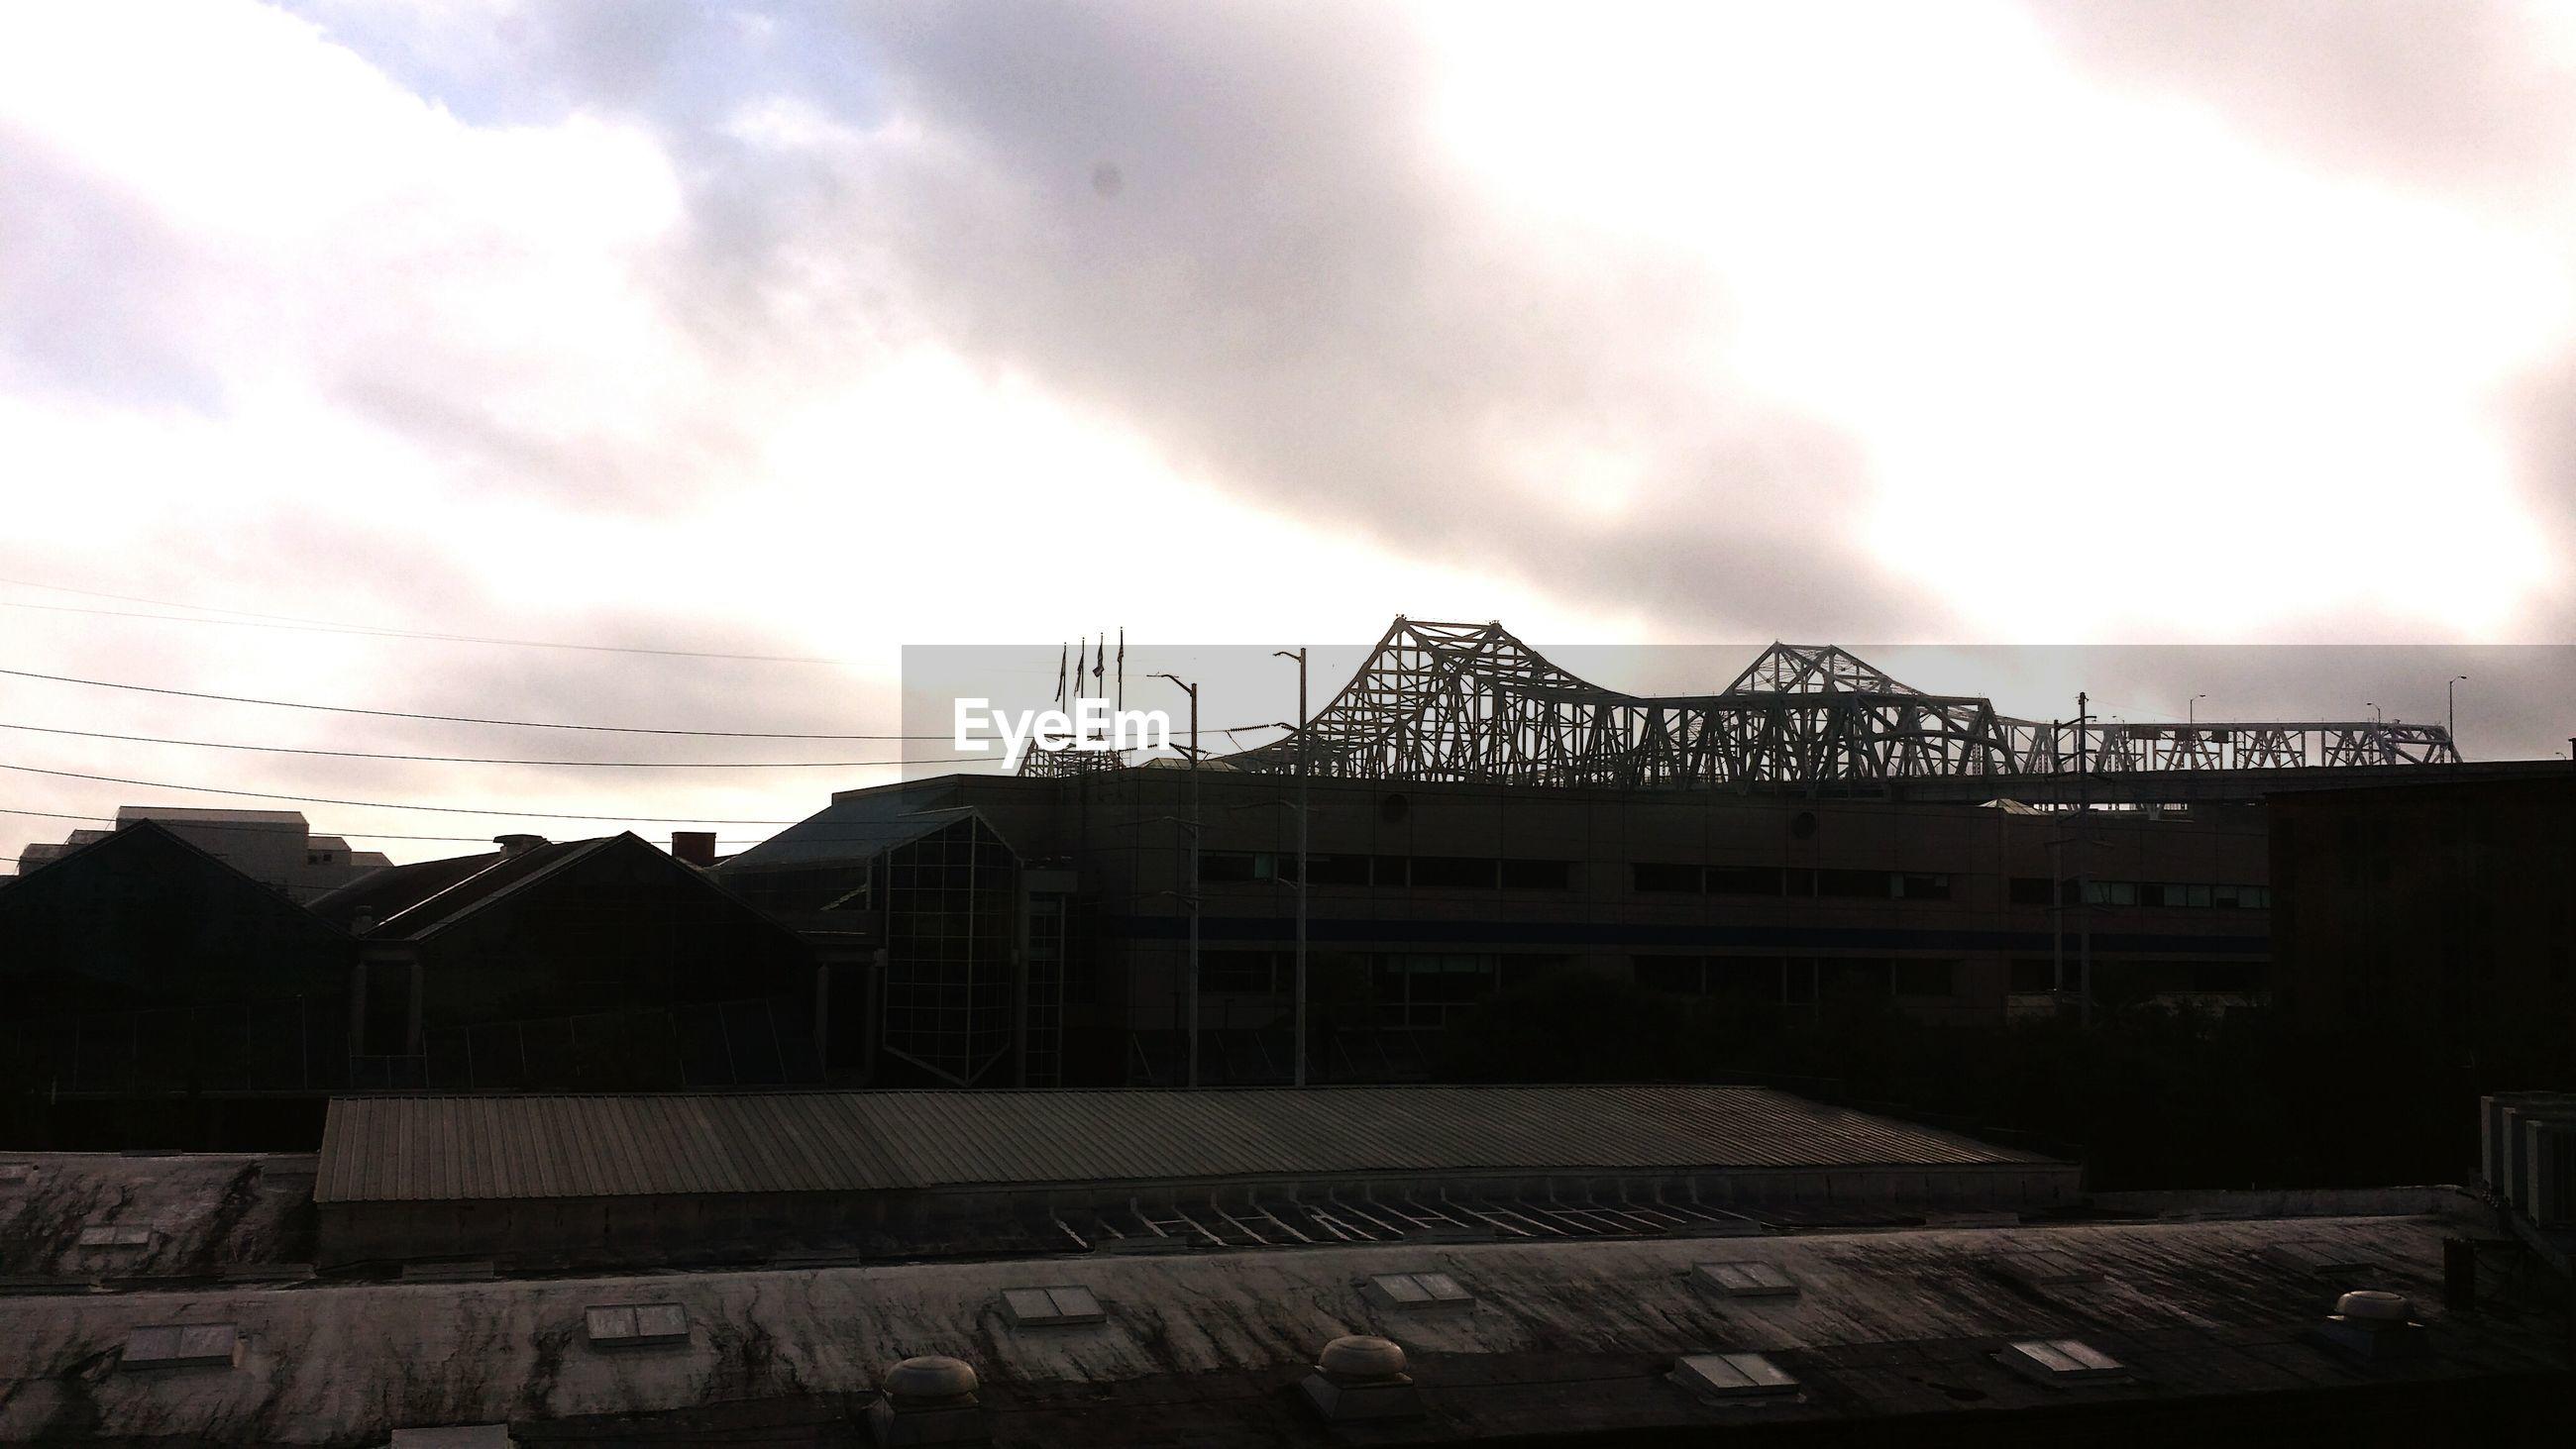 sky, architecture, built structure, building exterior, cloud - sky, cloudy, sunset, low angle view, silhouette, dusk, weather, cloud, overcast, crane - construction machinery, construction site, outdoors, bird, storm cloud, house, building